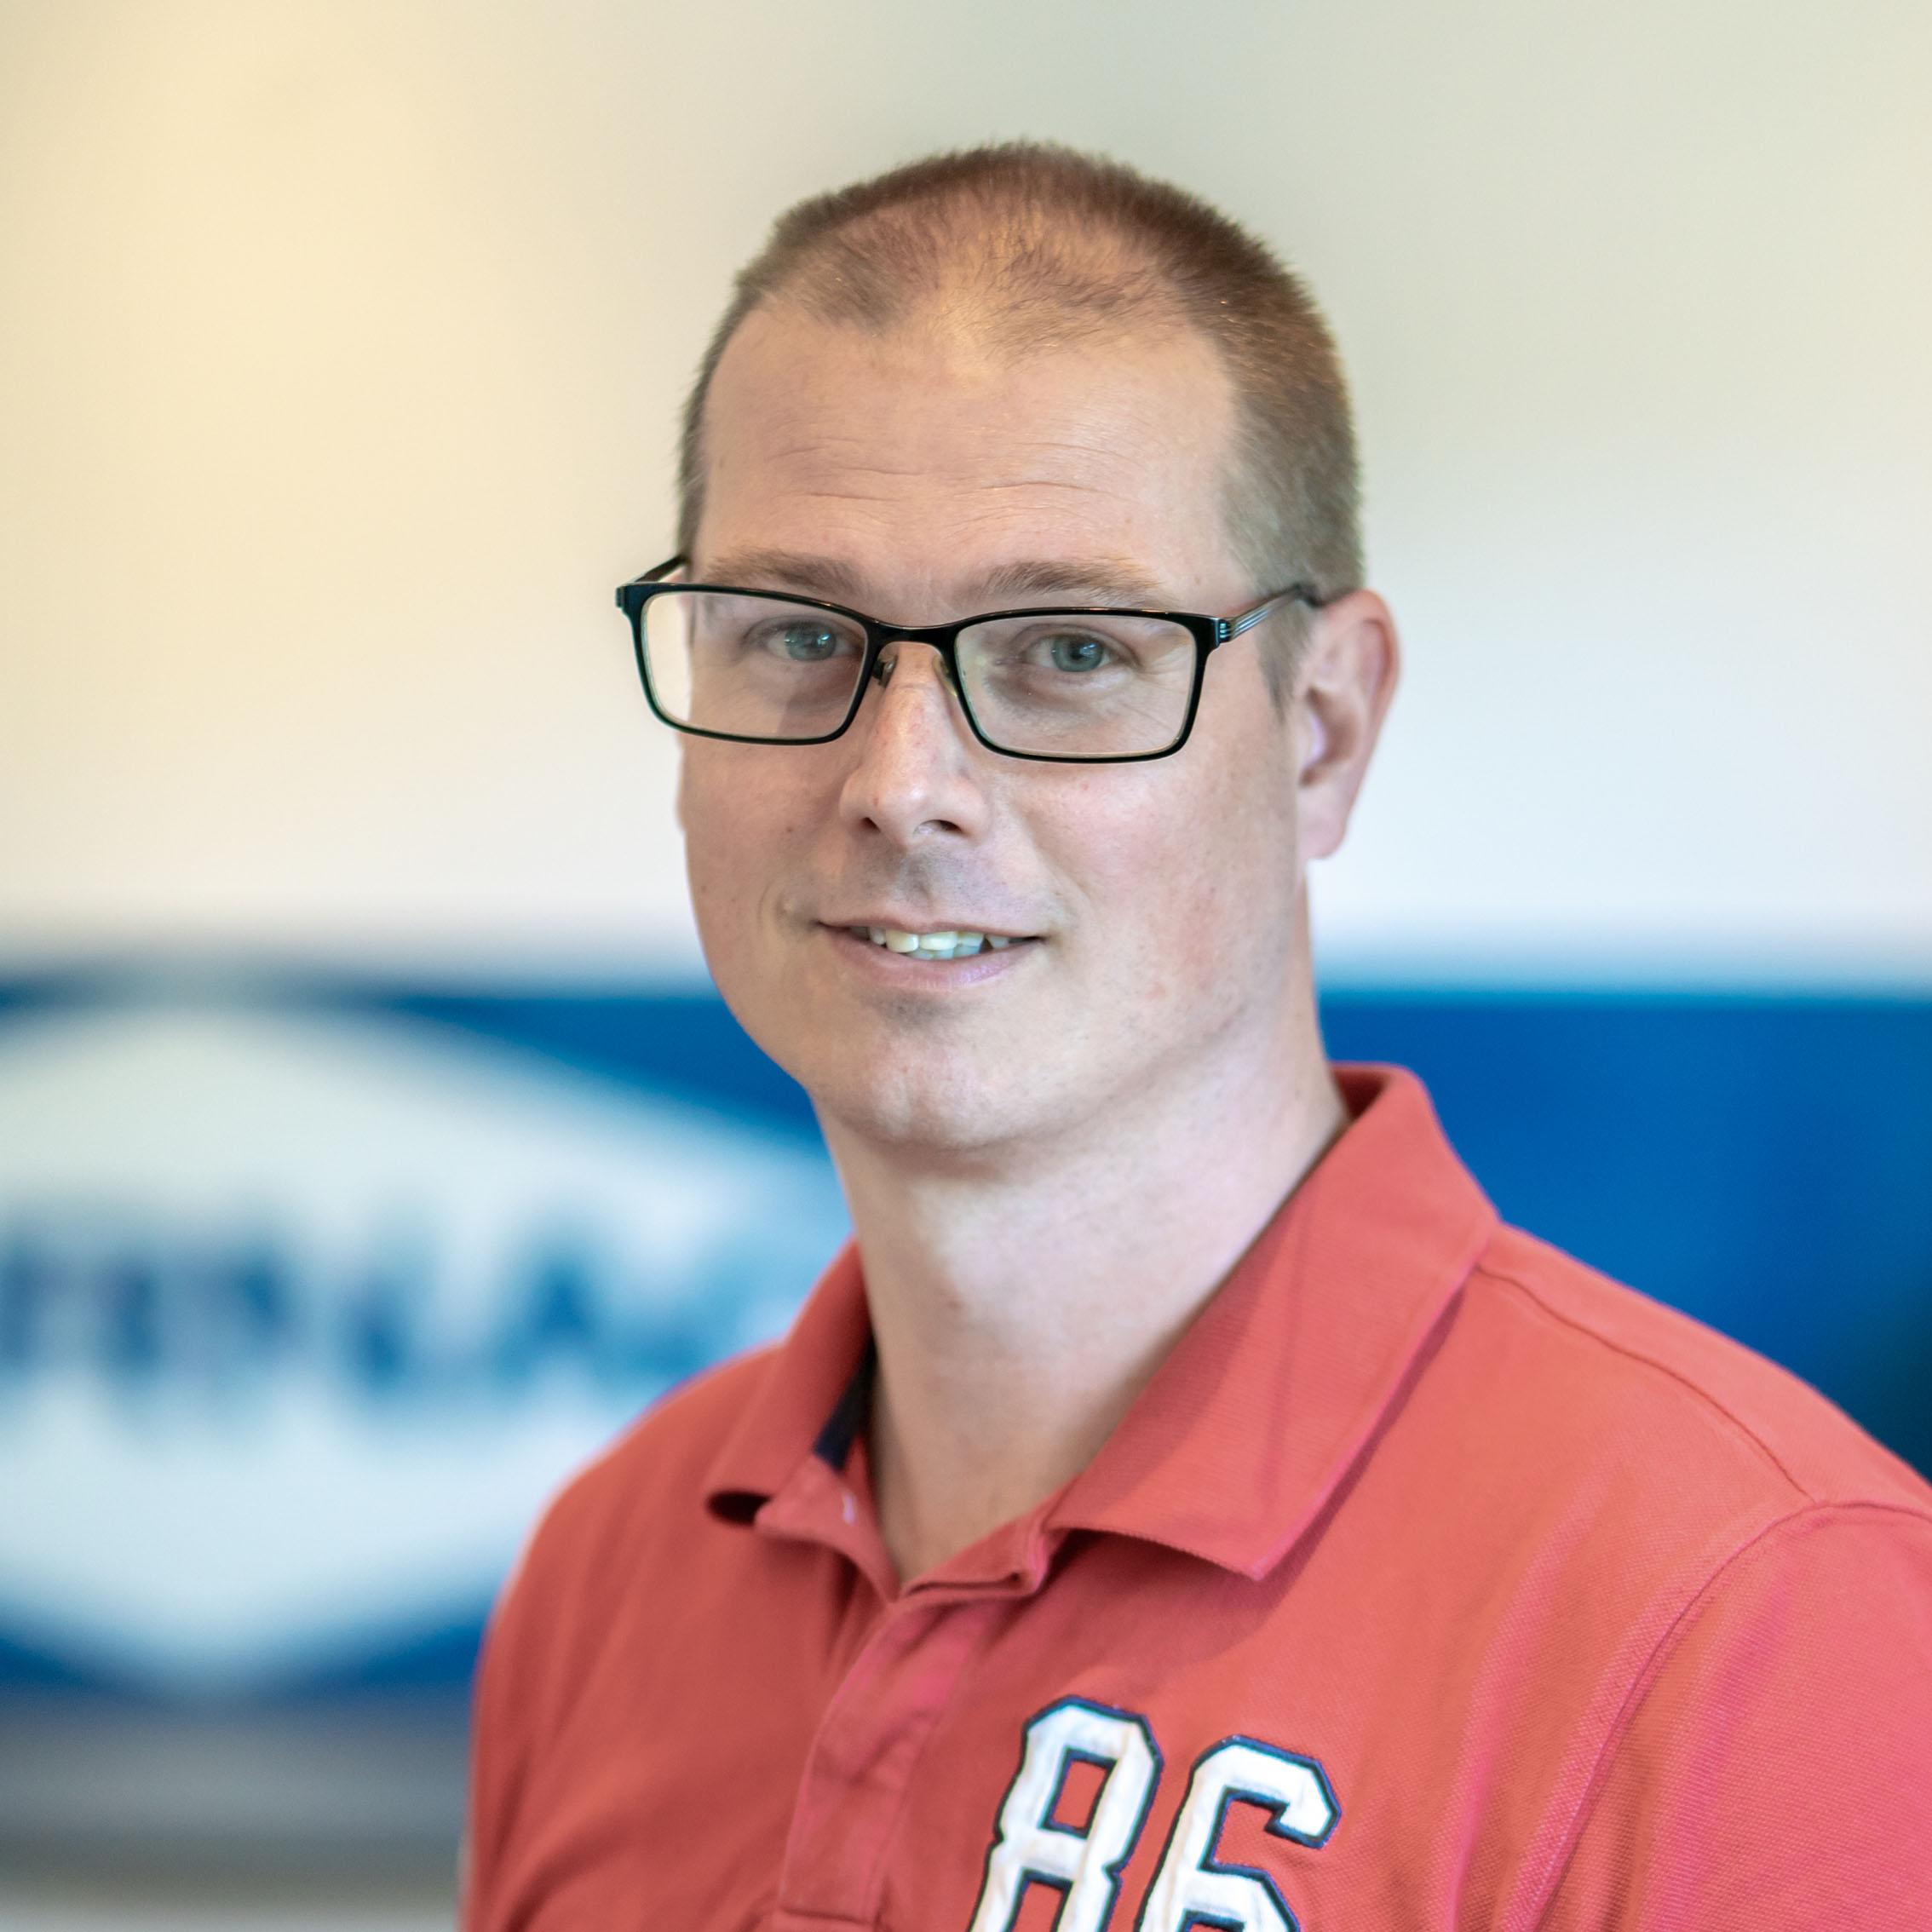 Daniel Karlsson - Personal på Karnag AB